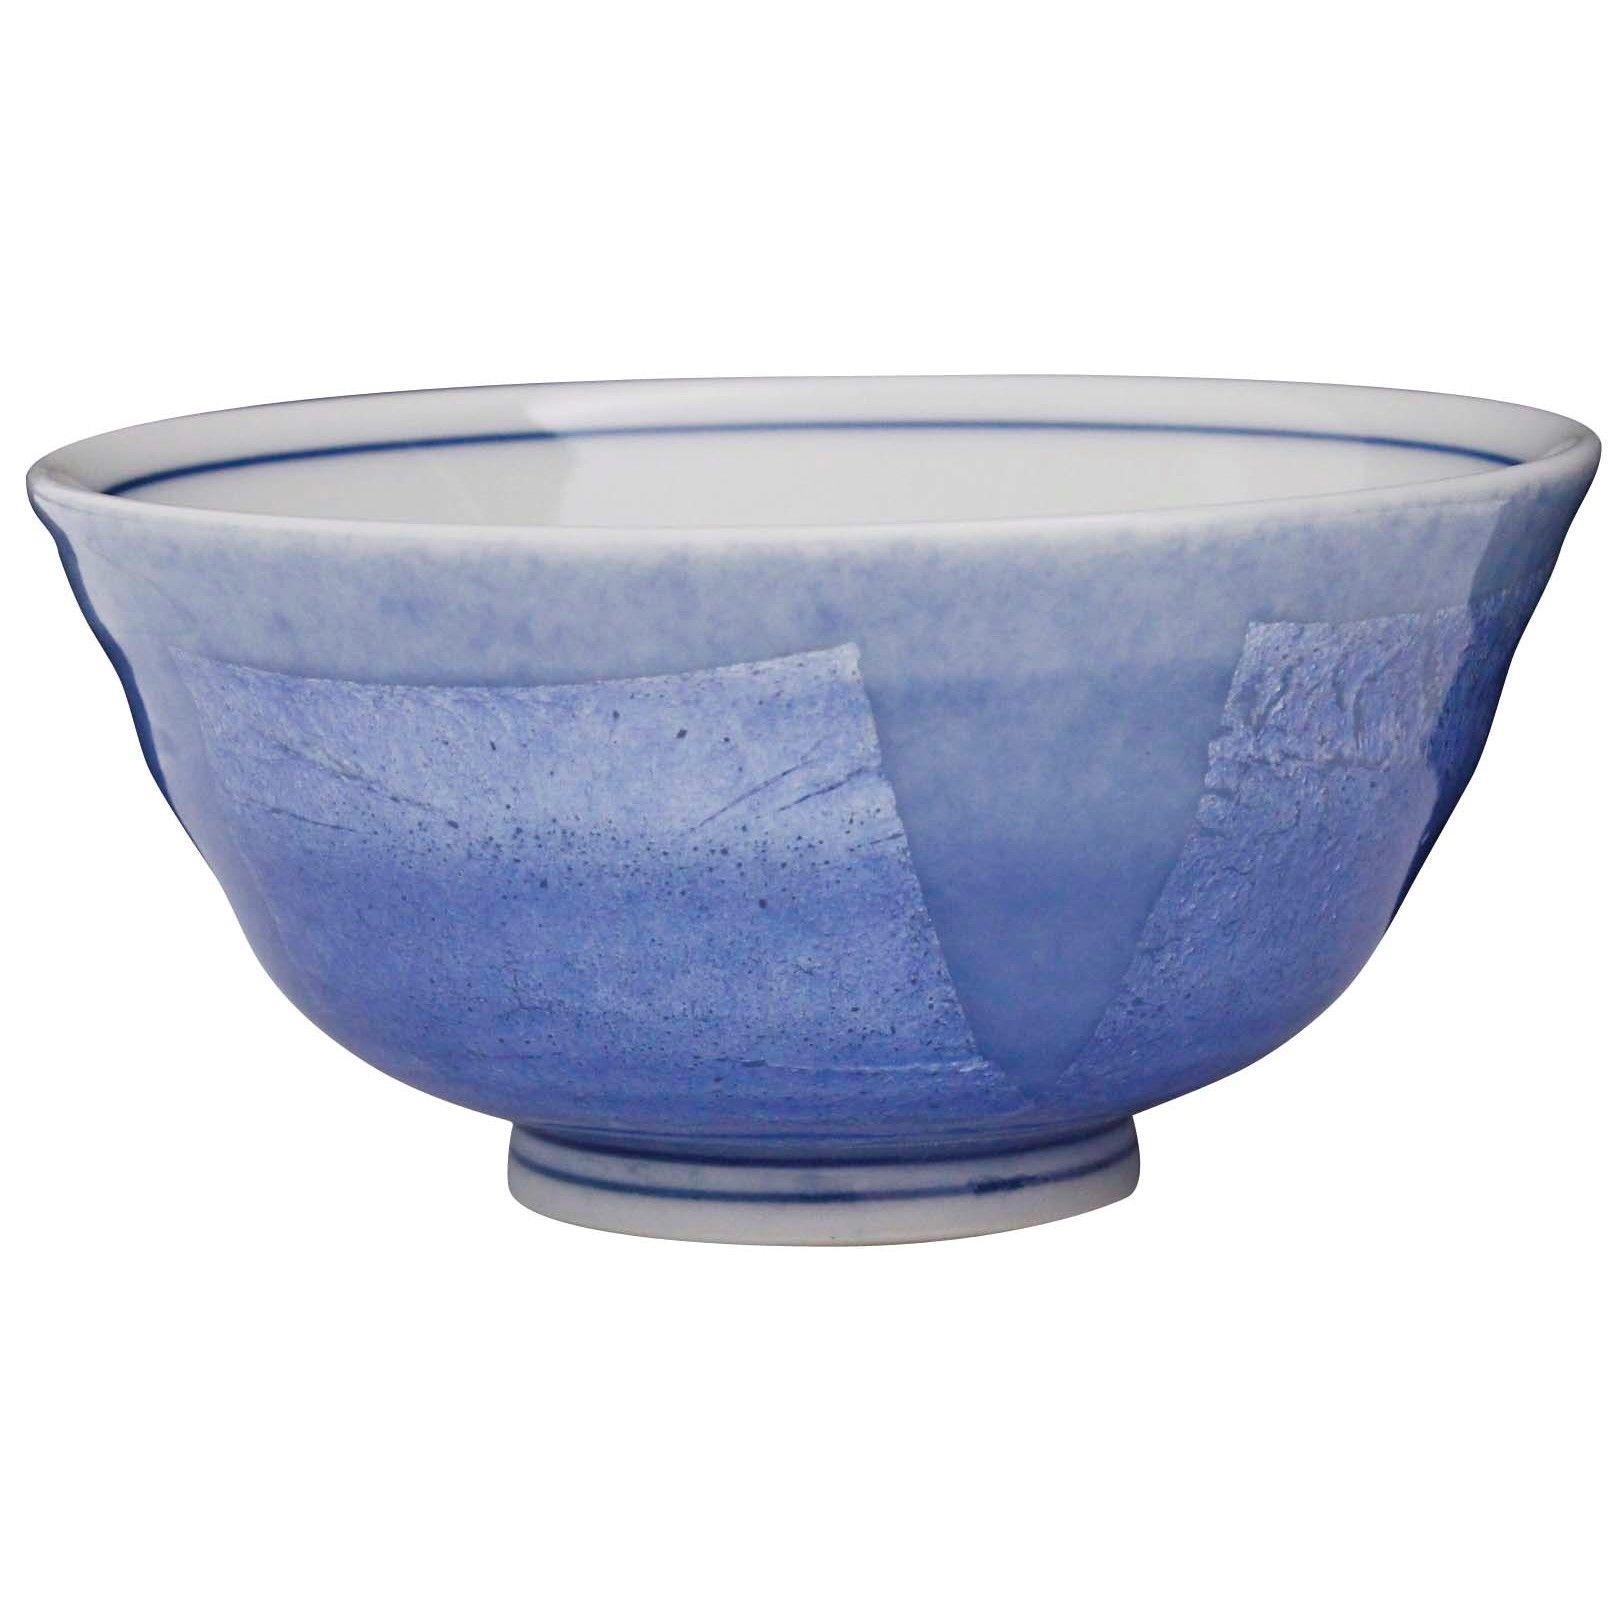 PK-24 姫碗 銀彩ブルー